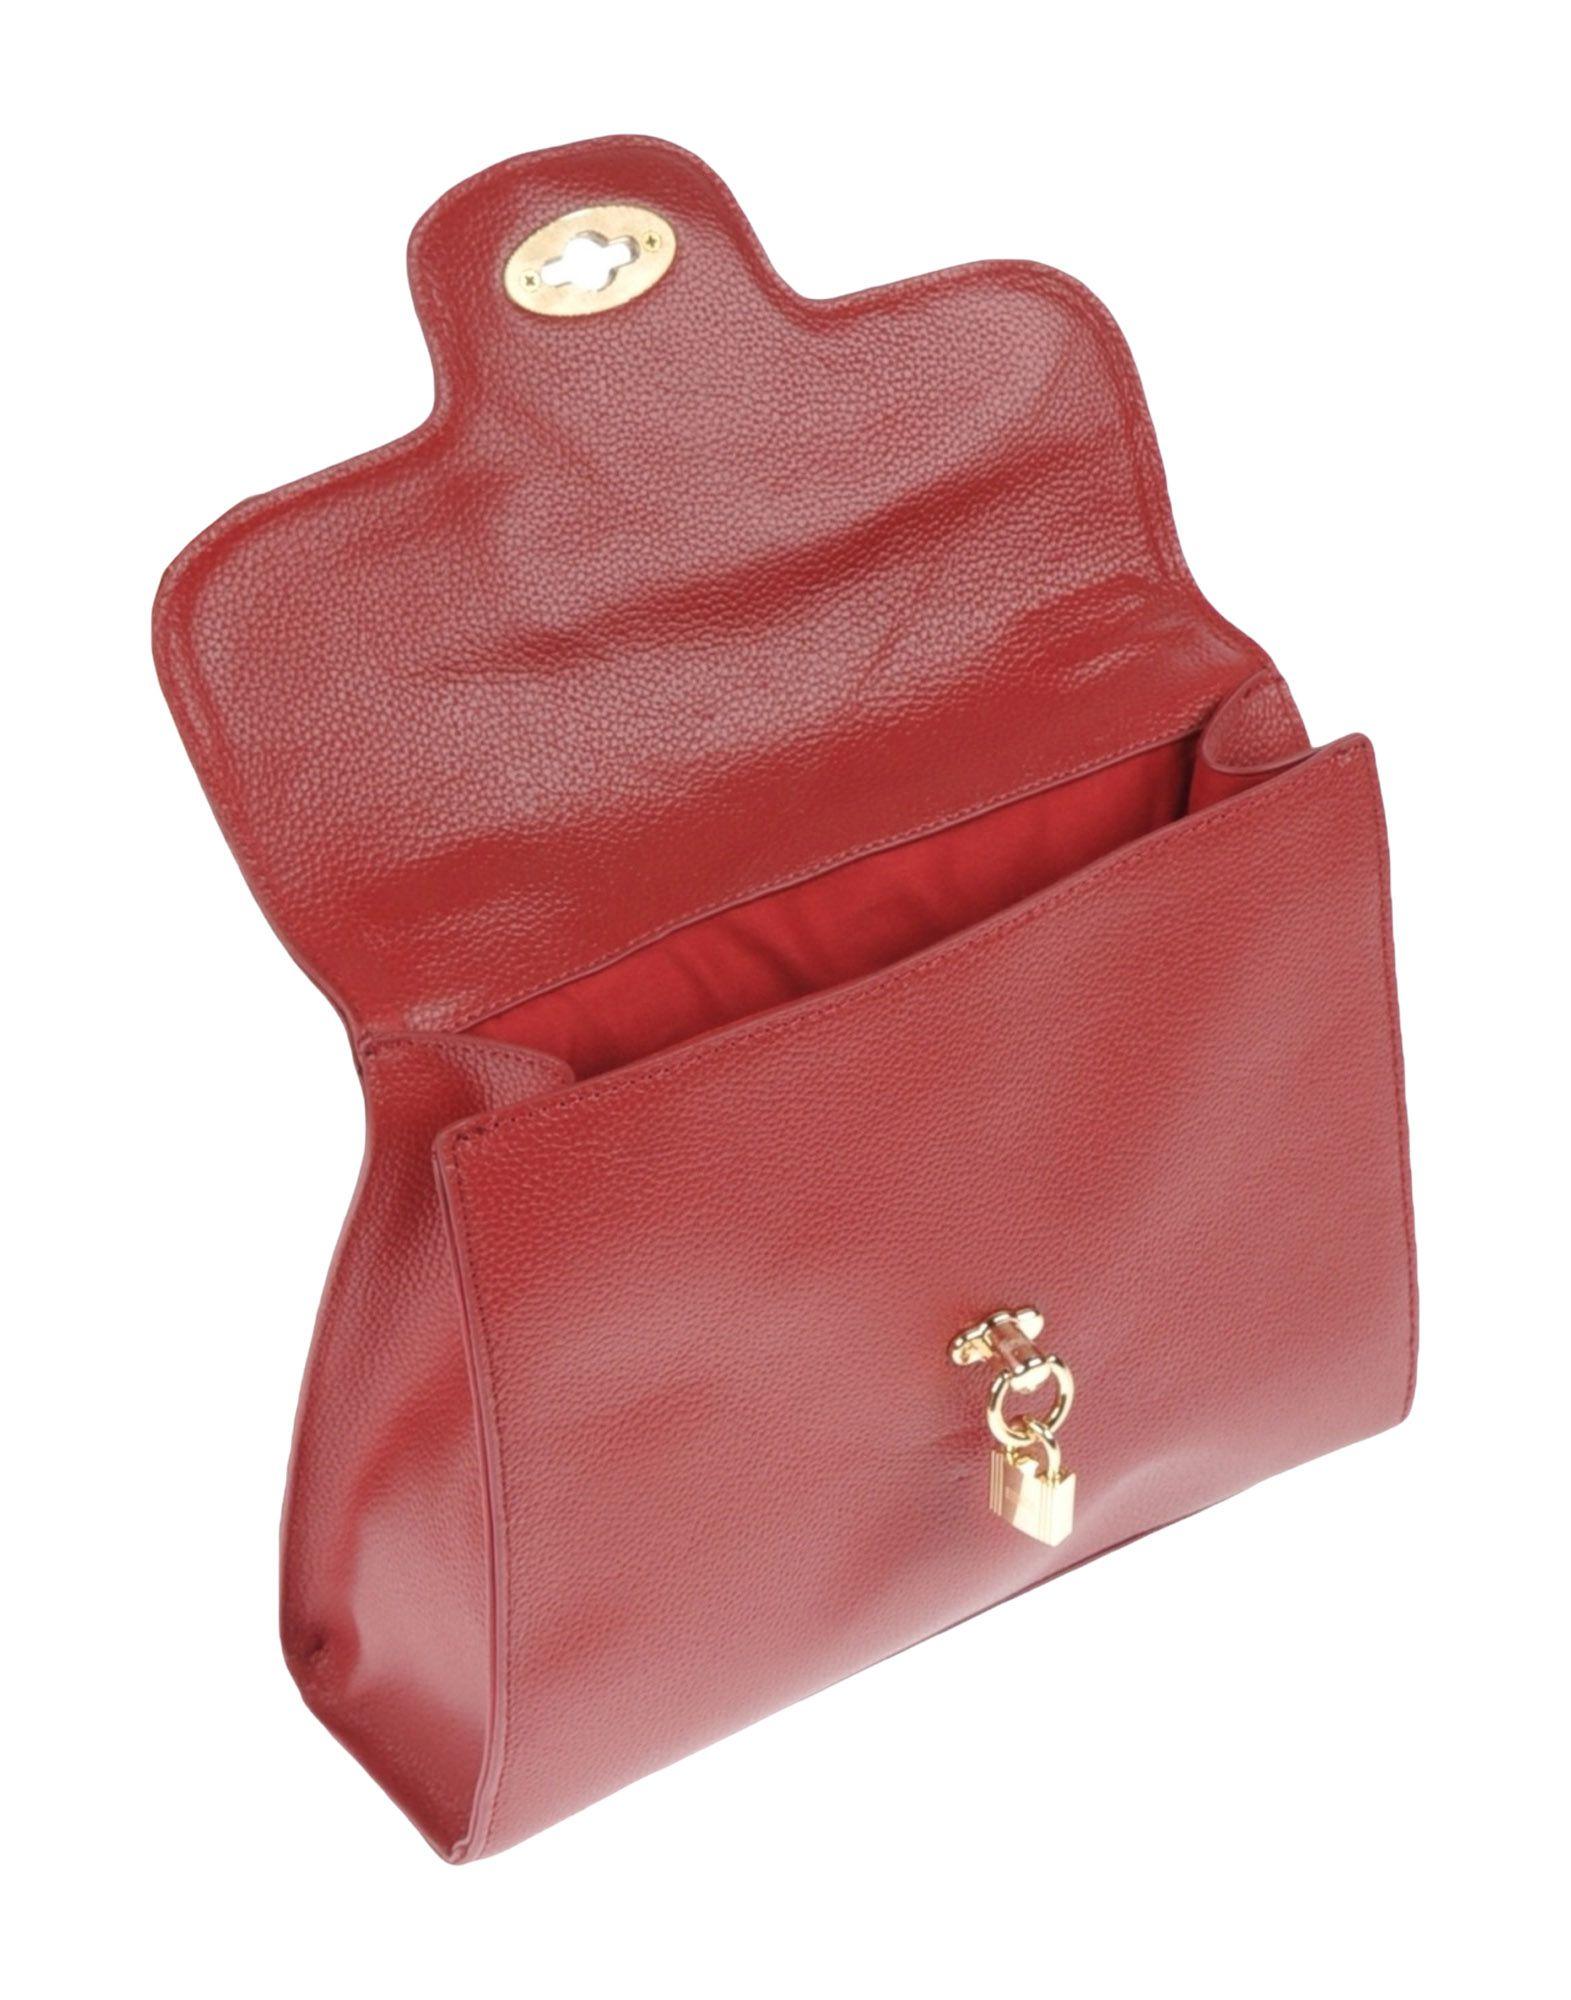 lyst jean louis scherrer handbag in red. Black Bedroom Furniture Sets. Home Design Ideas